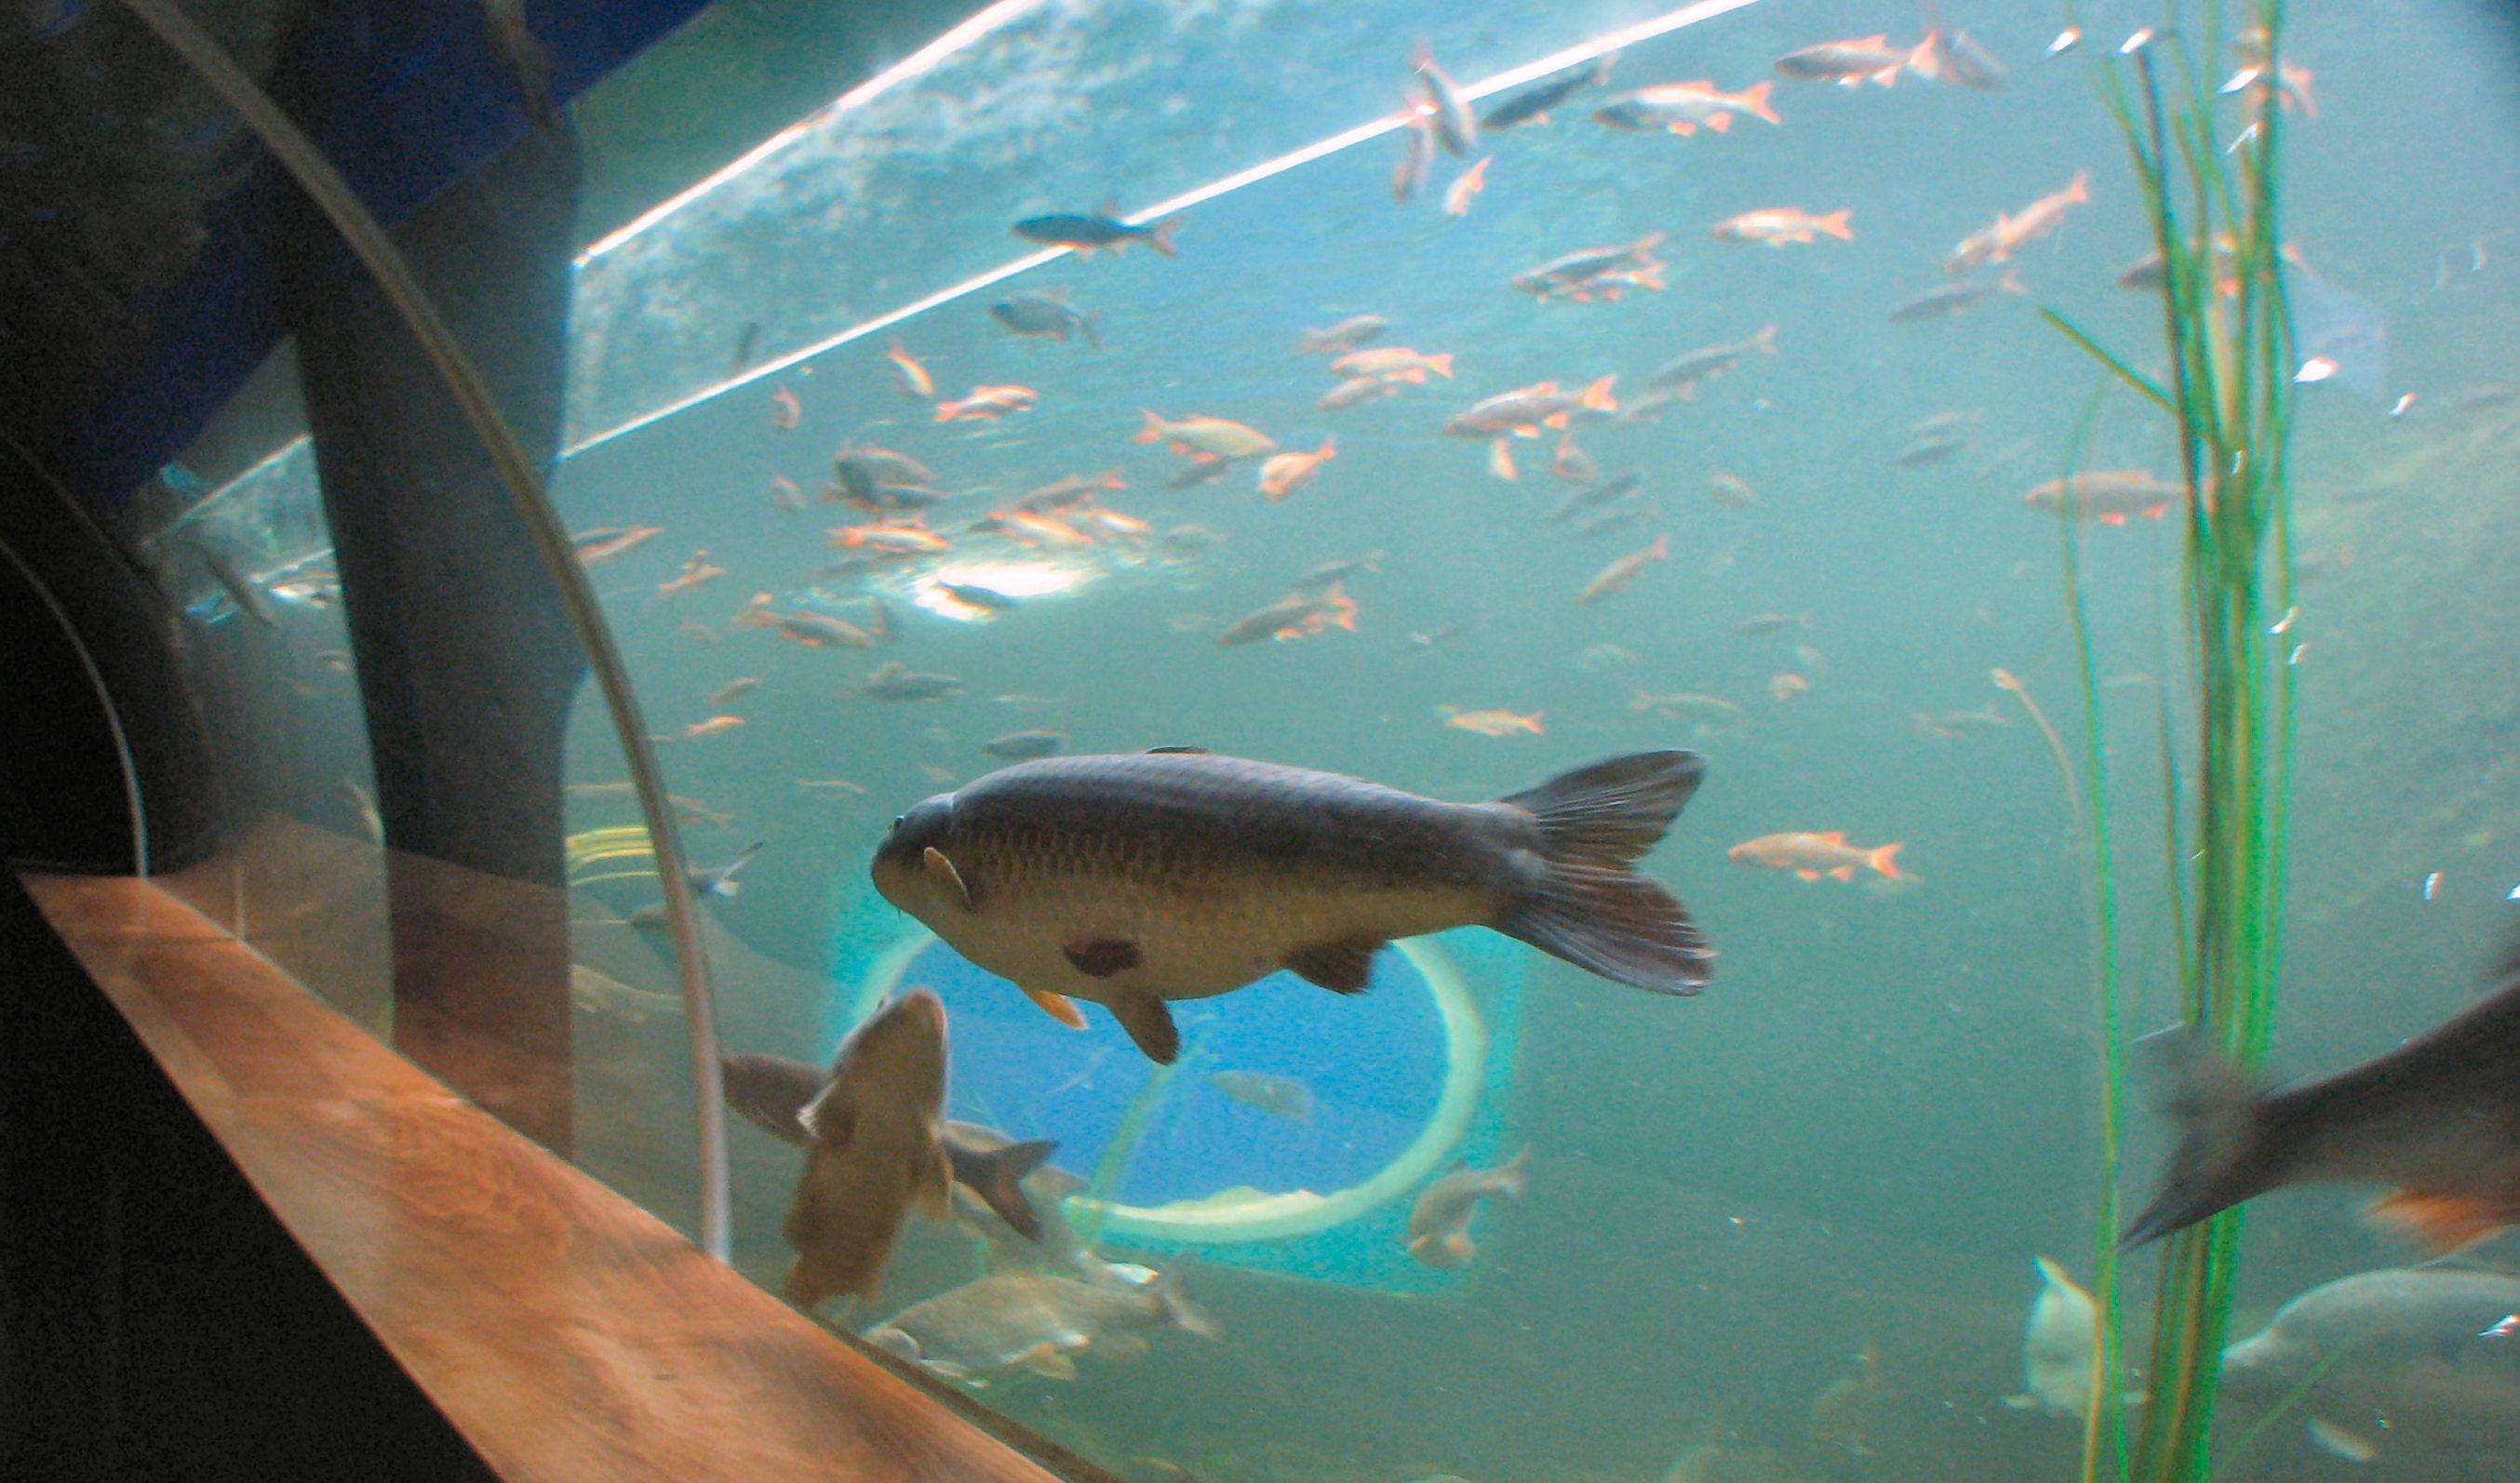 File:Fish at Lakes Aquarium Cumbria.jpg - Wikipedia, the free ...